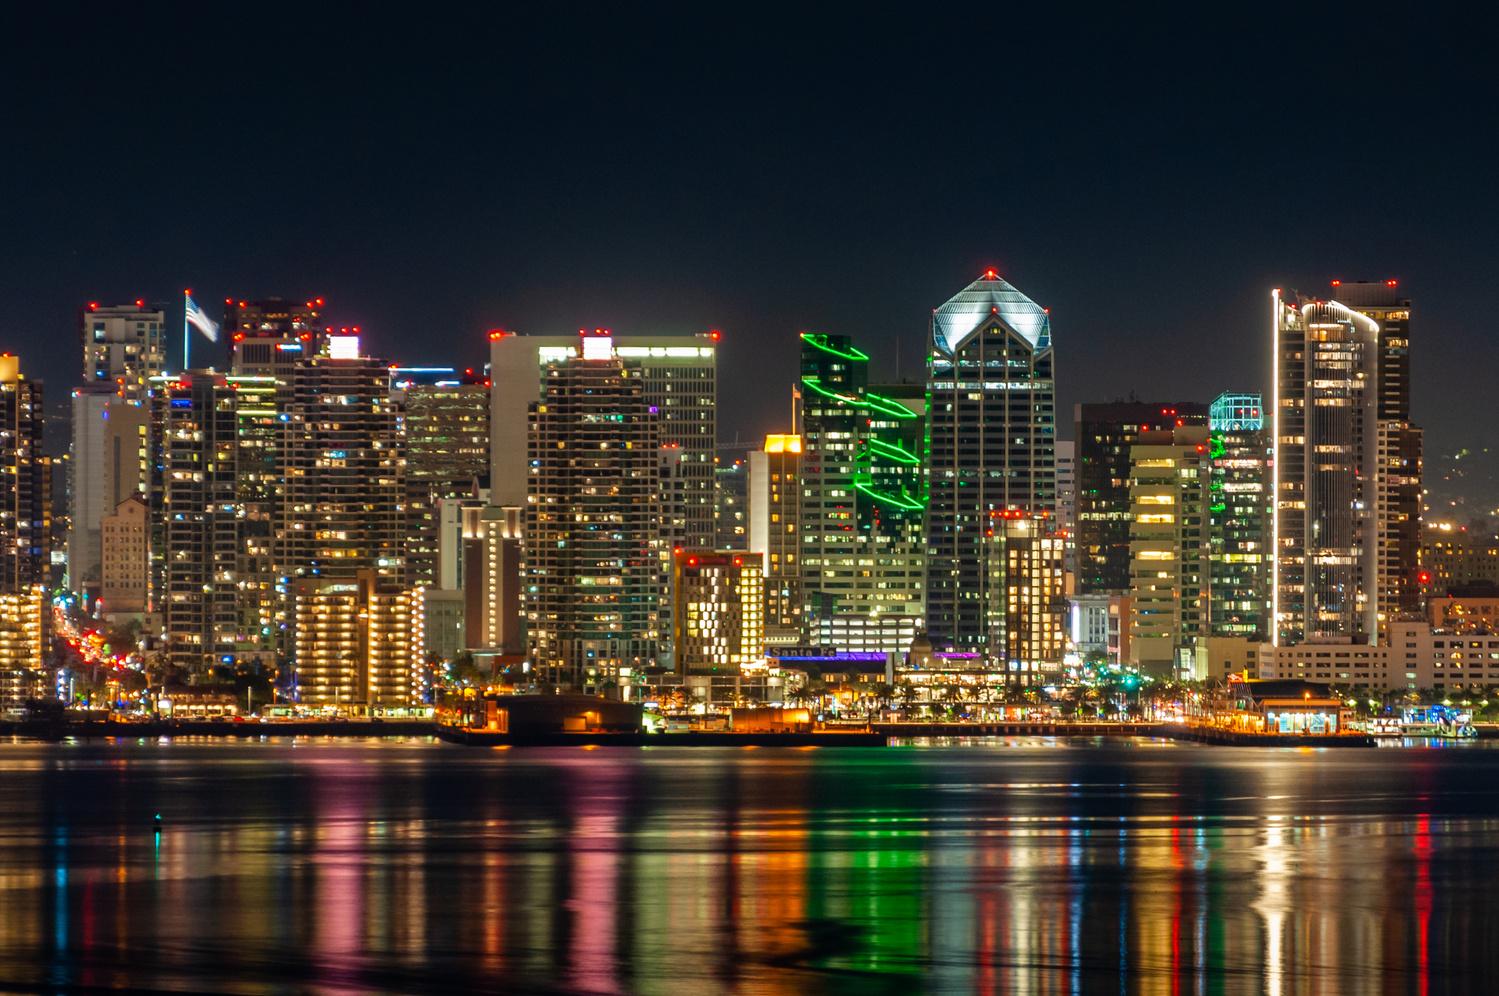 Downtown San Diego by Josh Utley